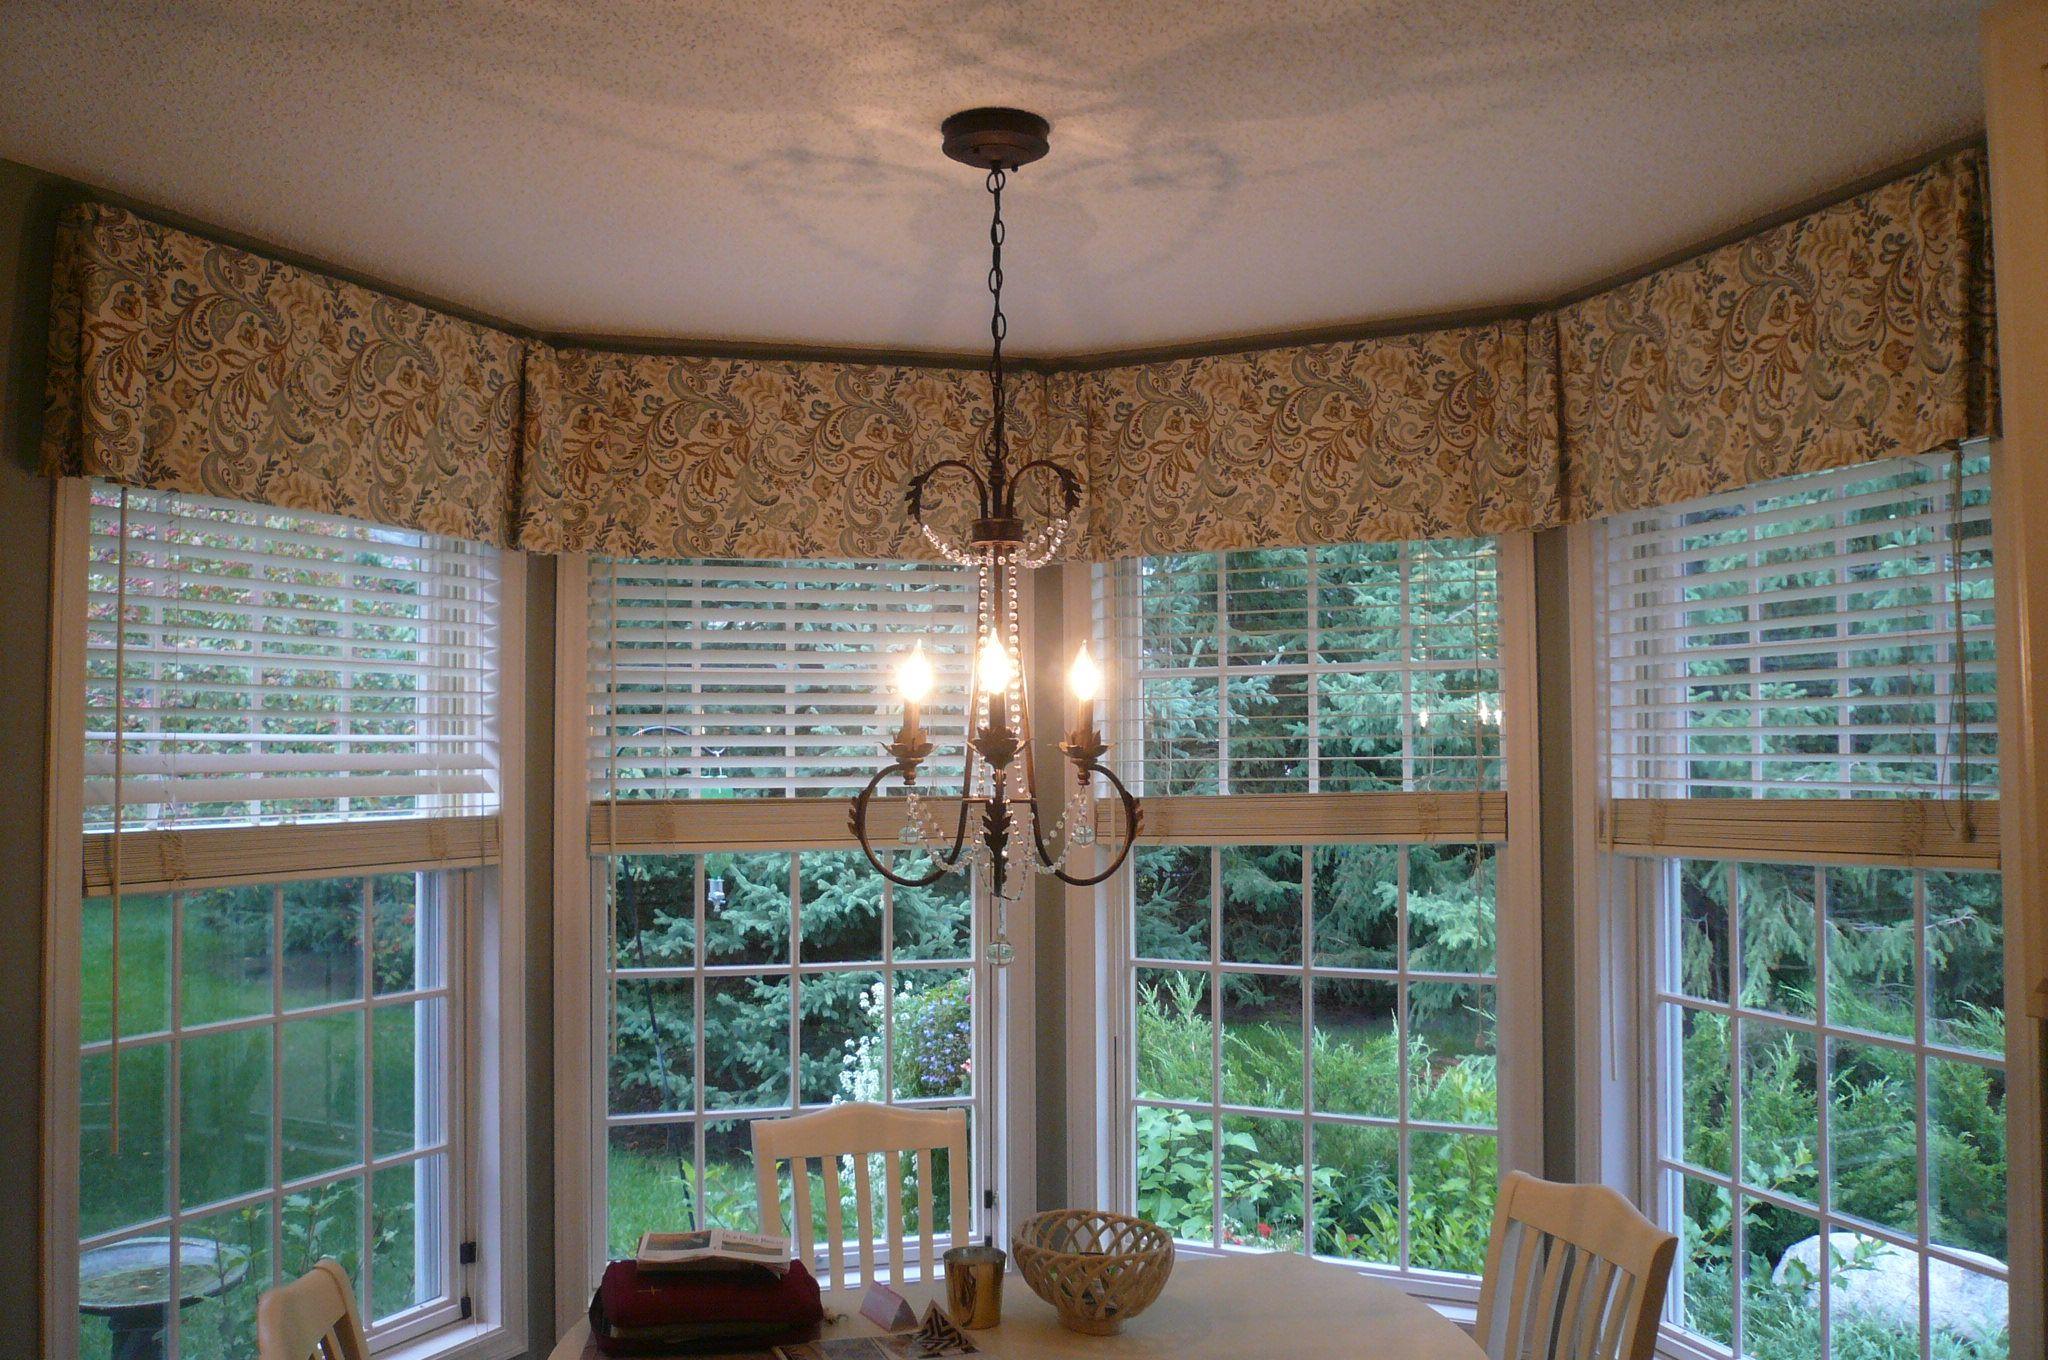 Bay window valance home decor pinterest - Pinterest kitchen window treatments ...